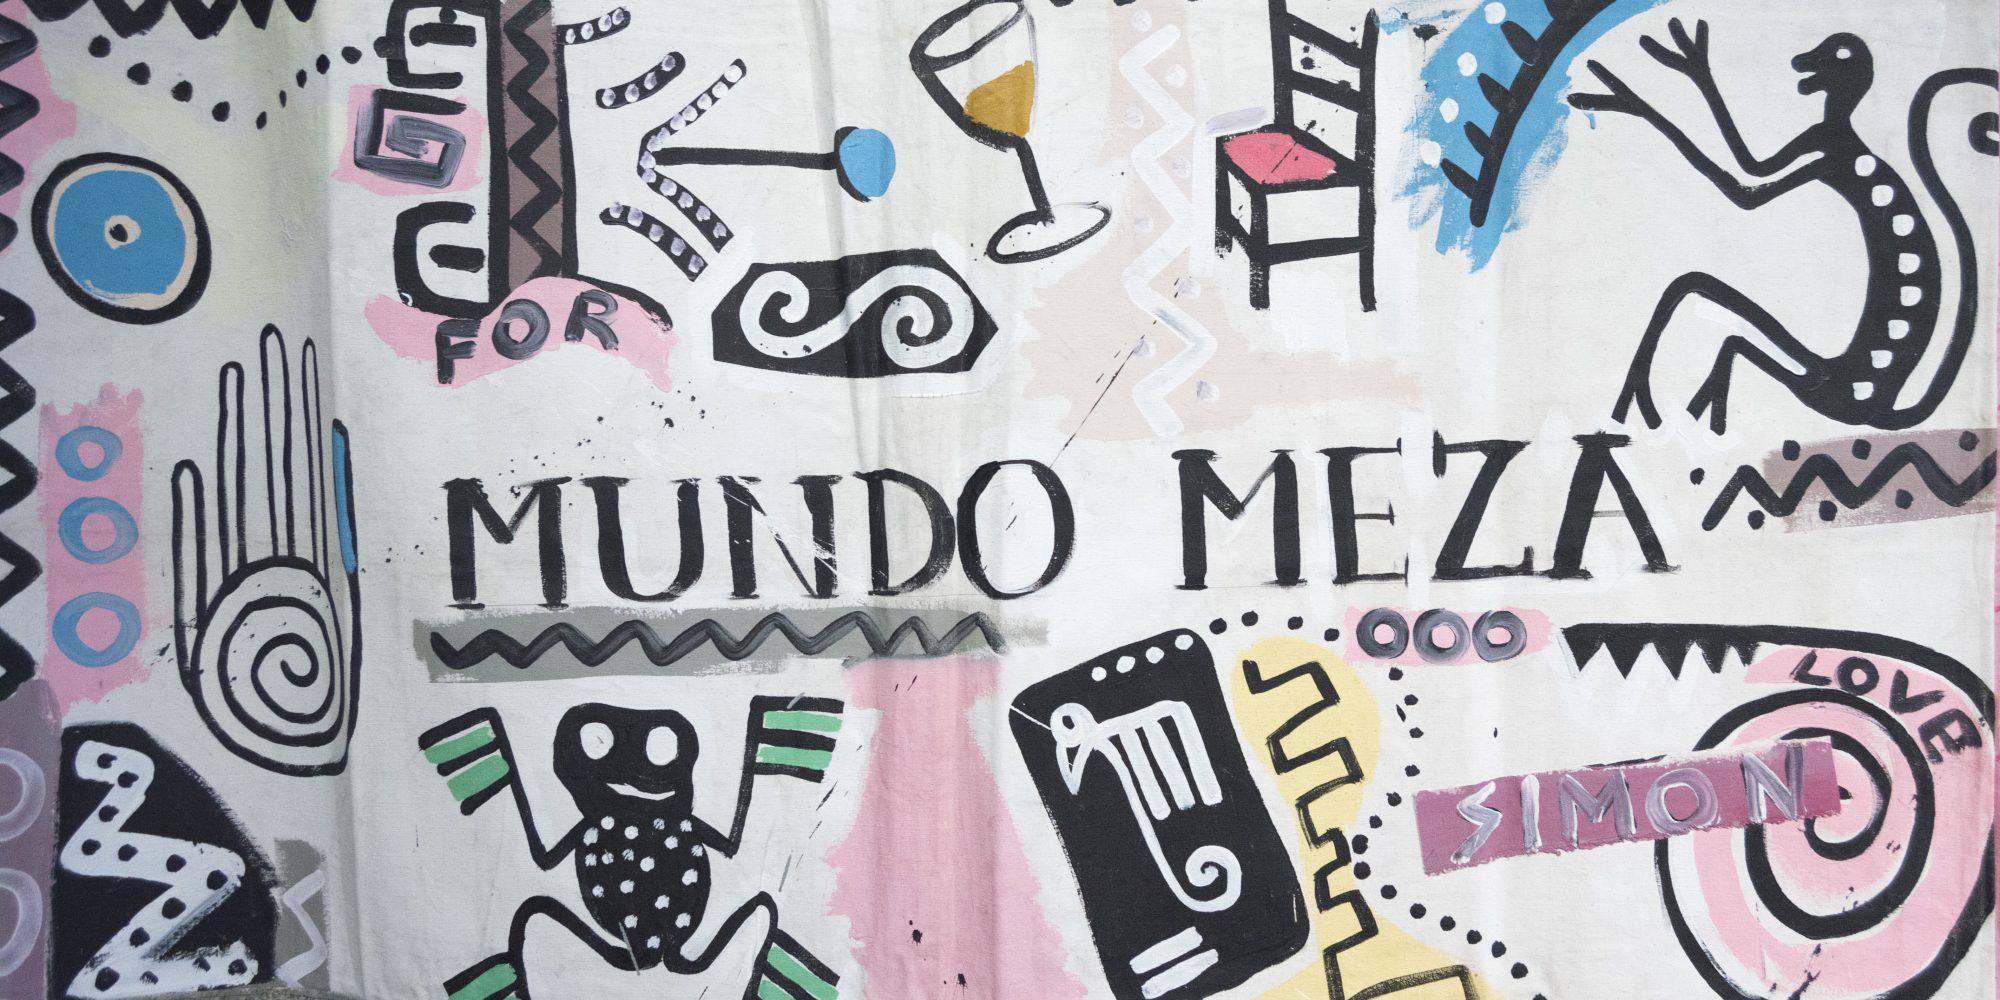 AIDS Memorial Quilt, Mundo Meza